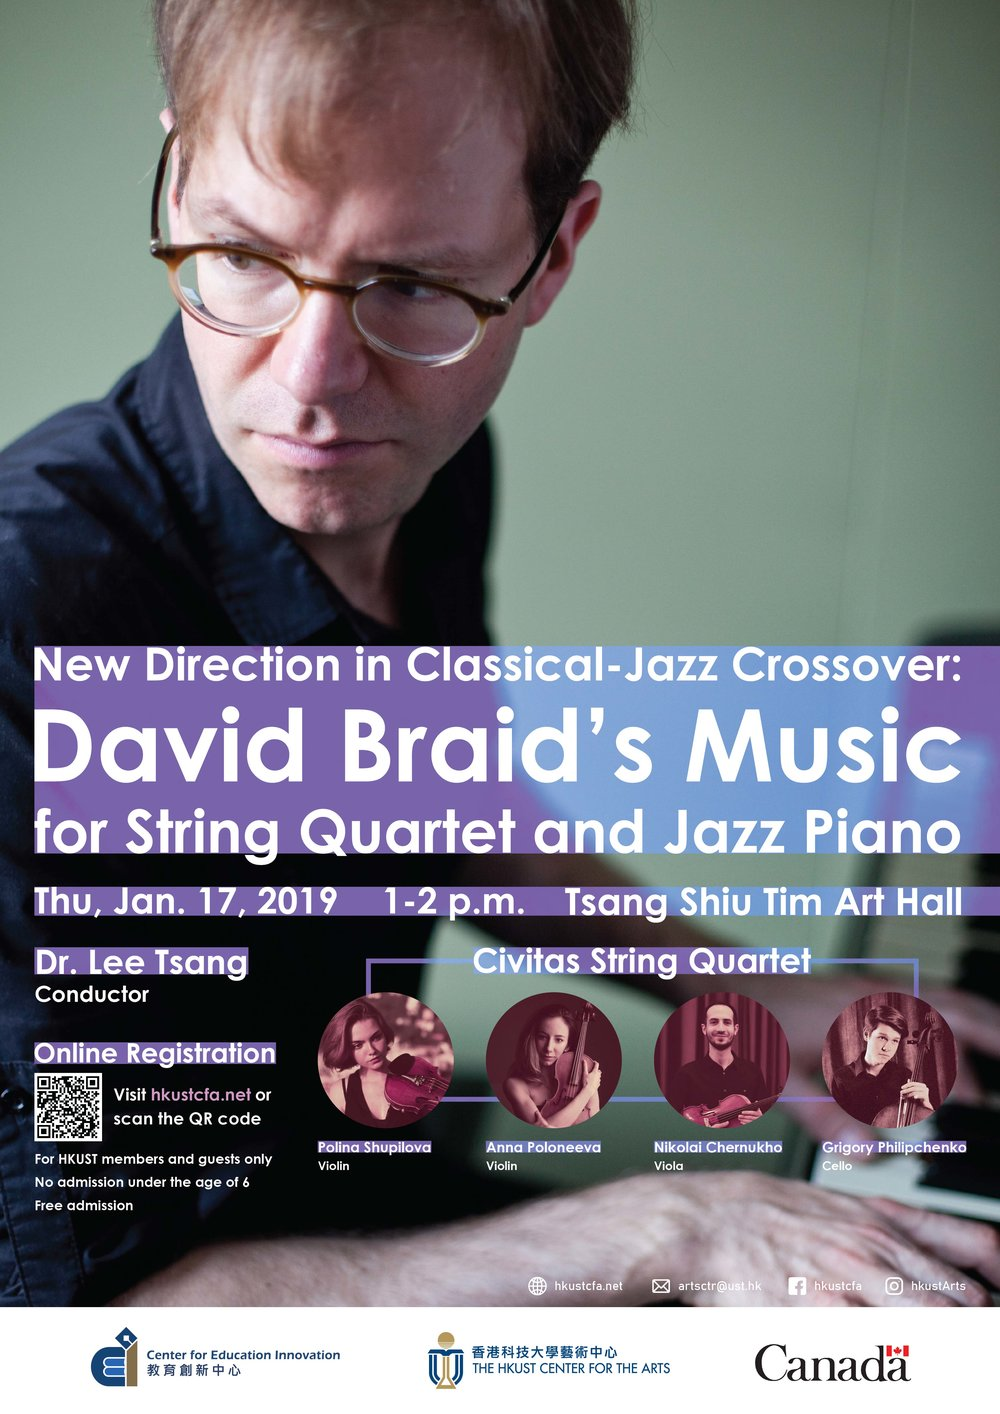 Poster_Concert by David Braid_20190119_purple-01.jpg